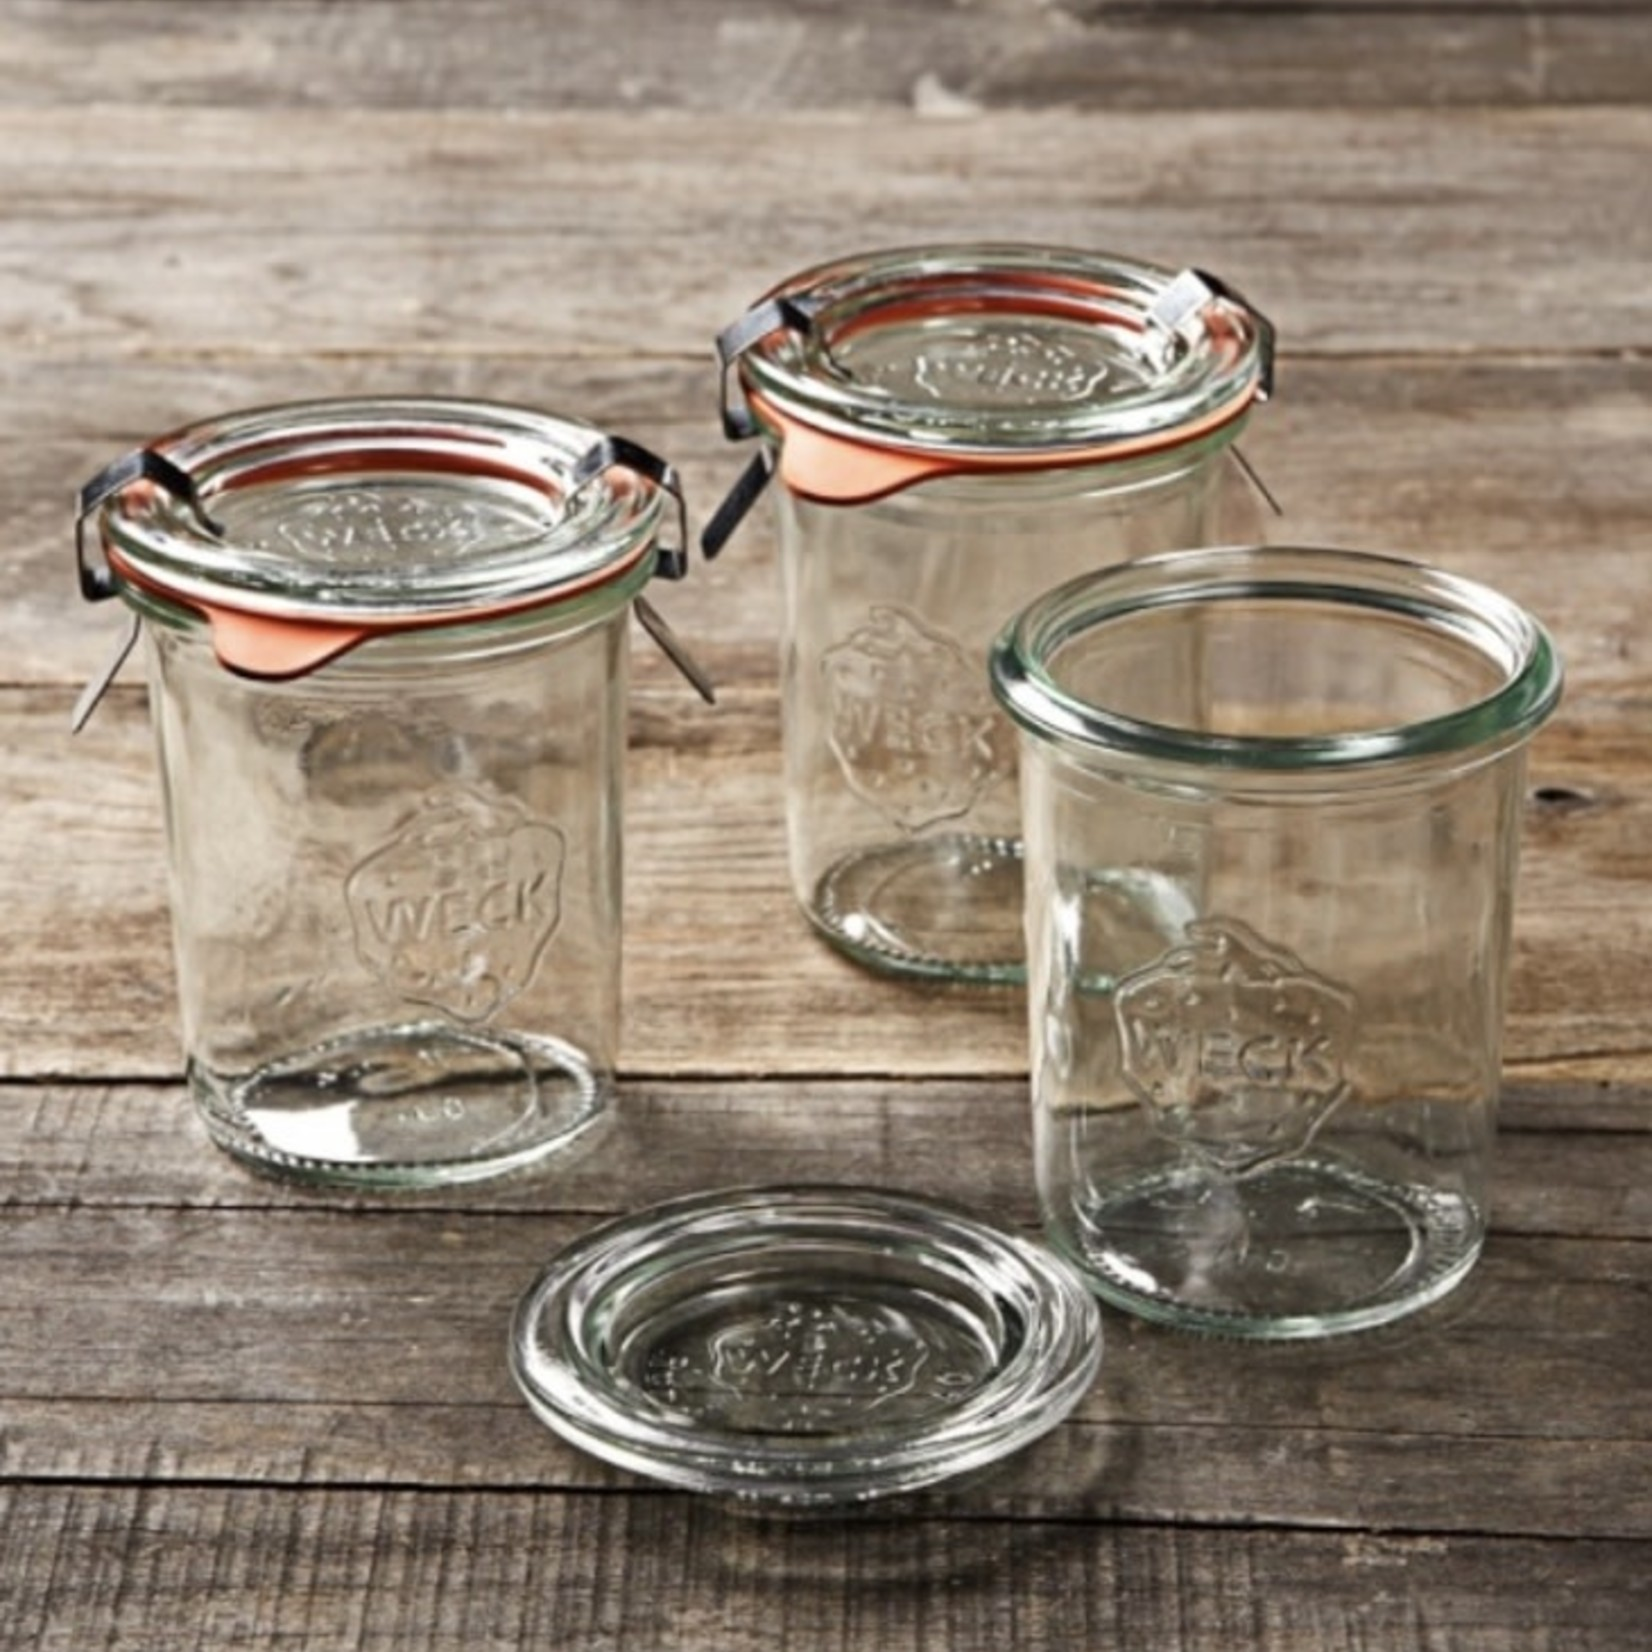 Weck Mold Jar 3/4 L